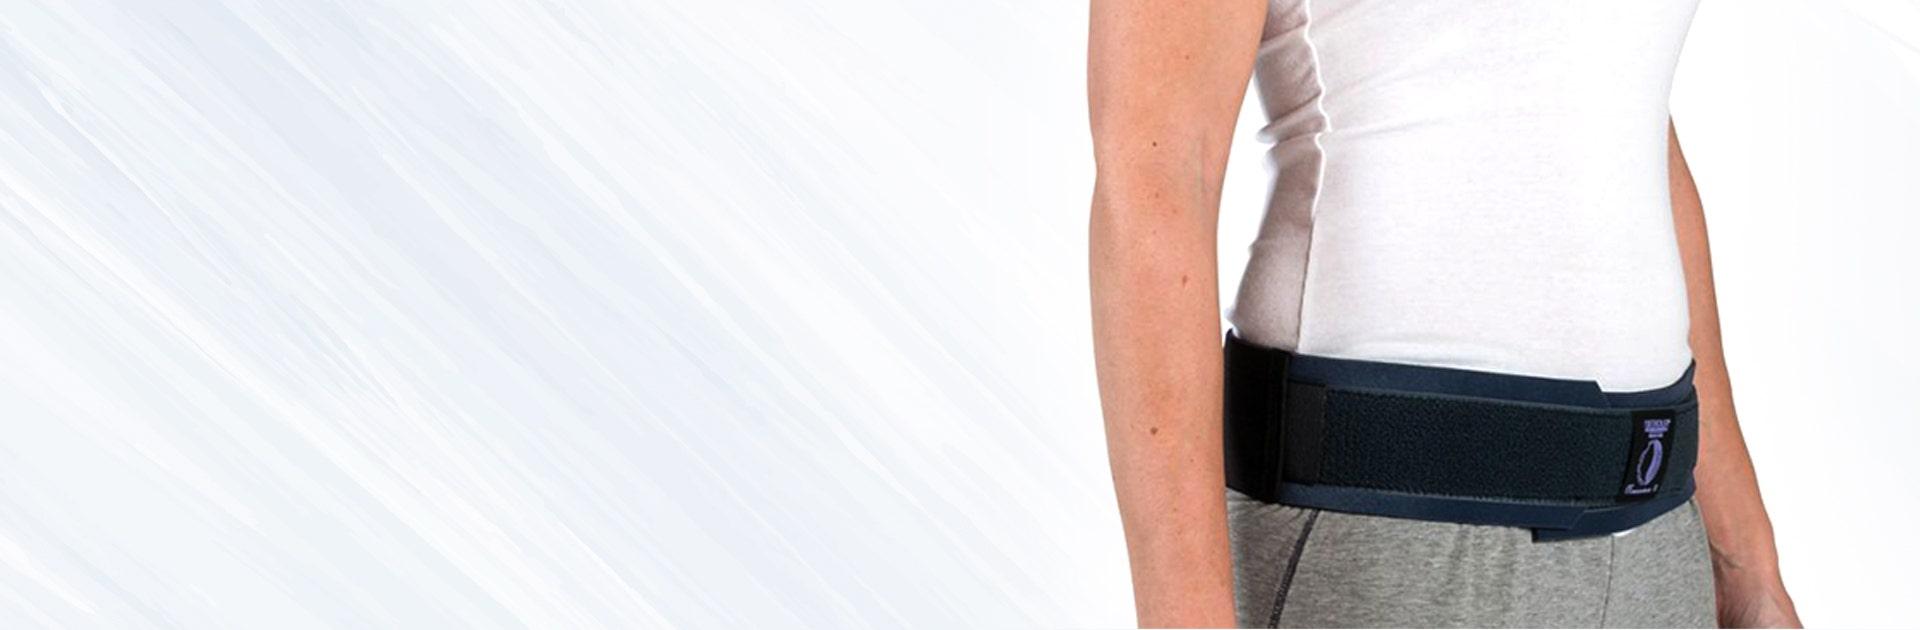 SI (sacroiliac joint) Belts